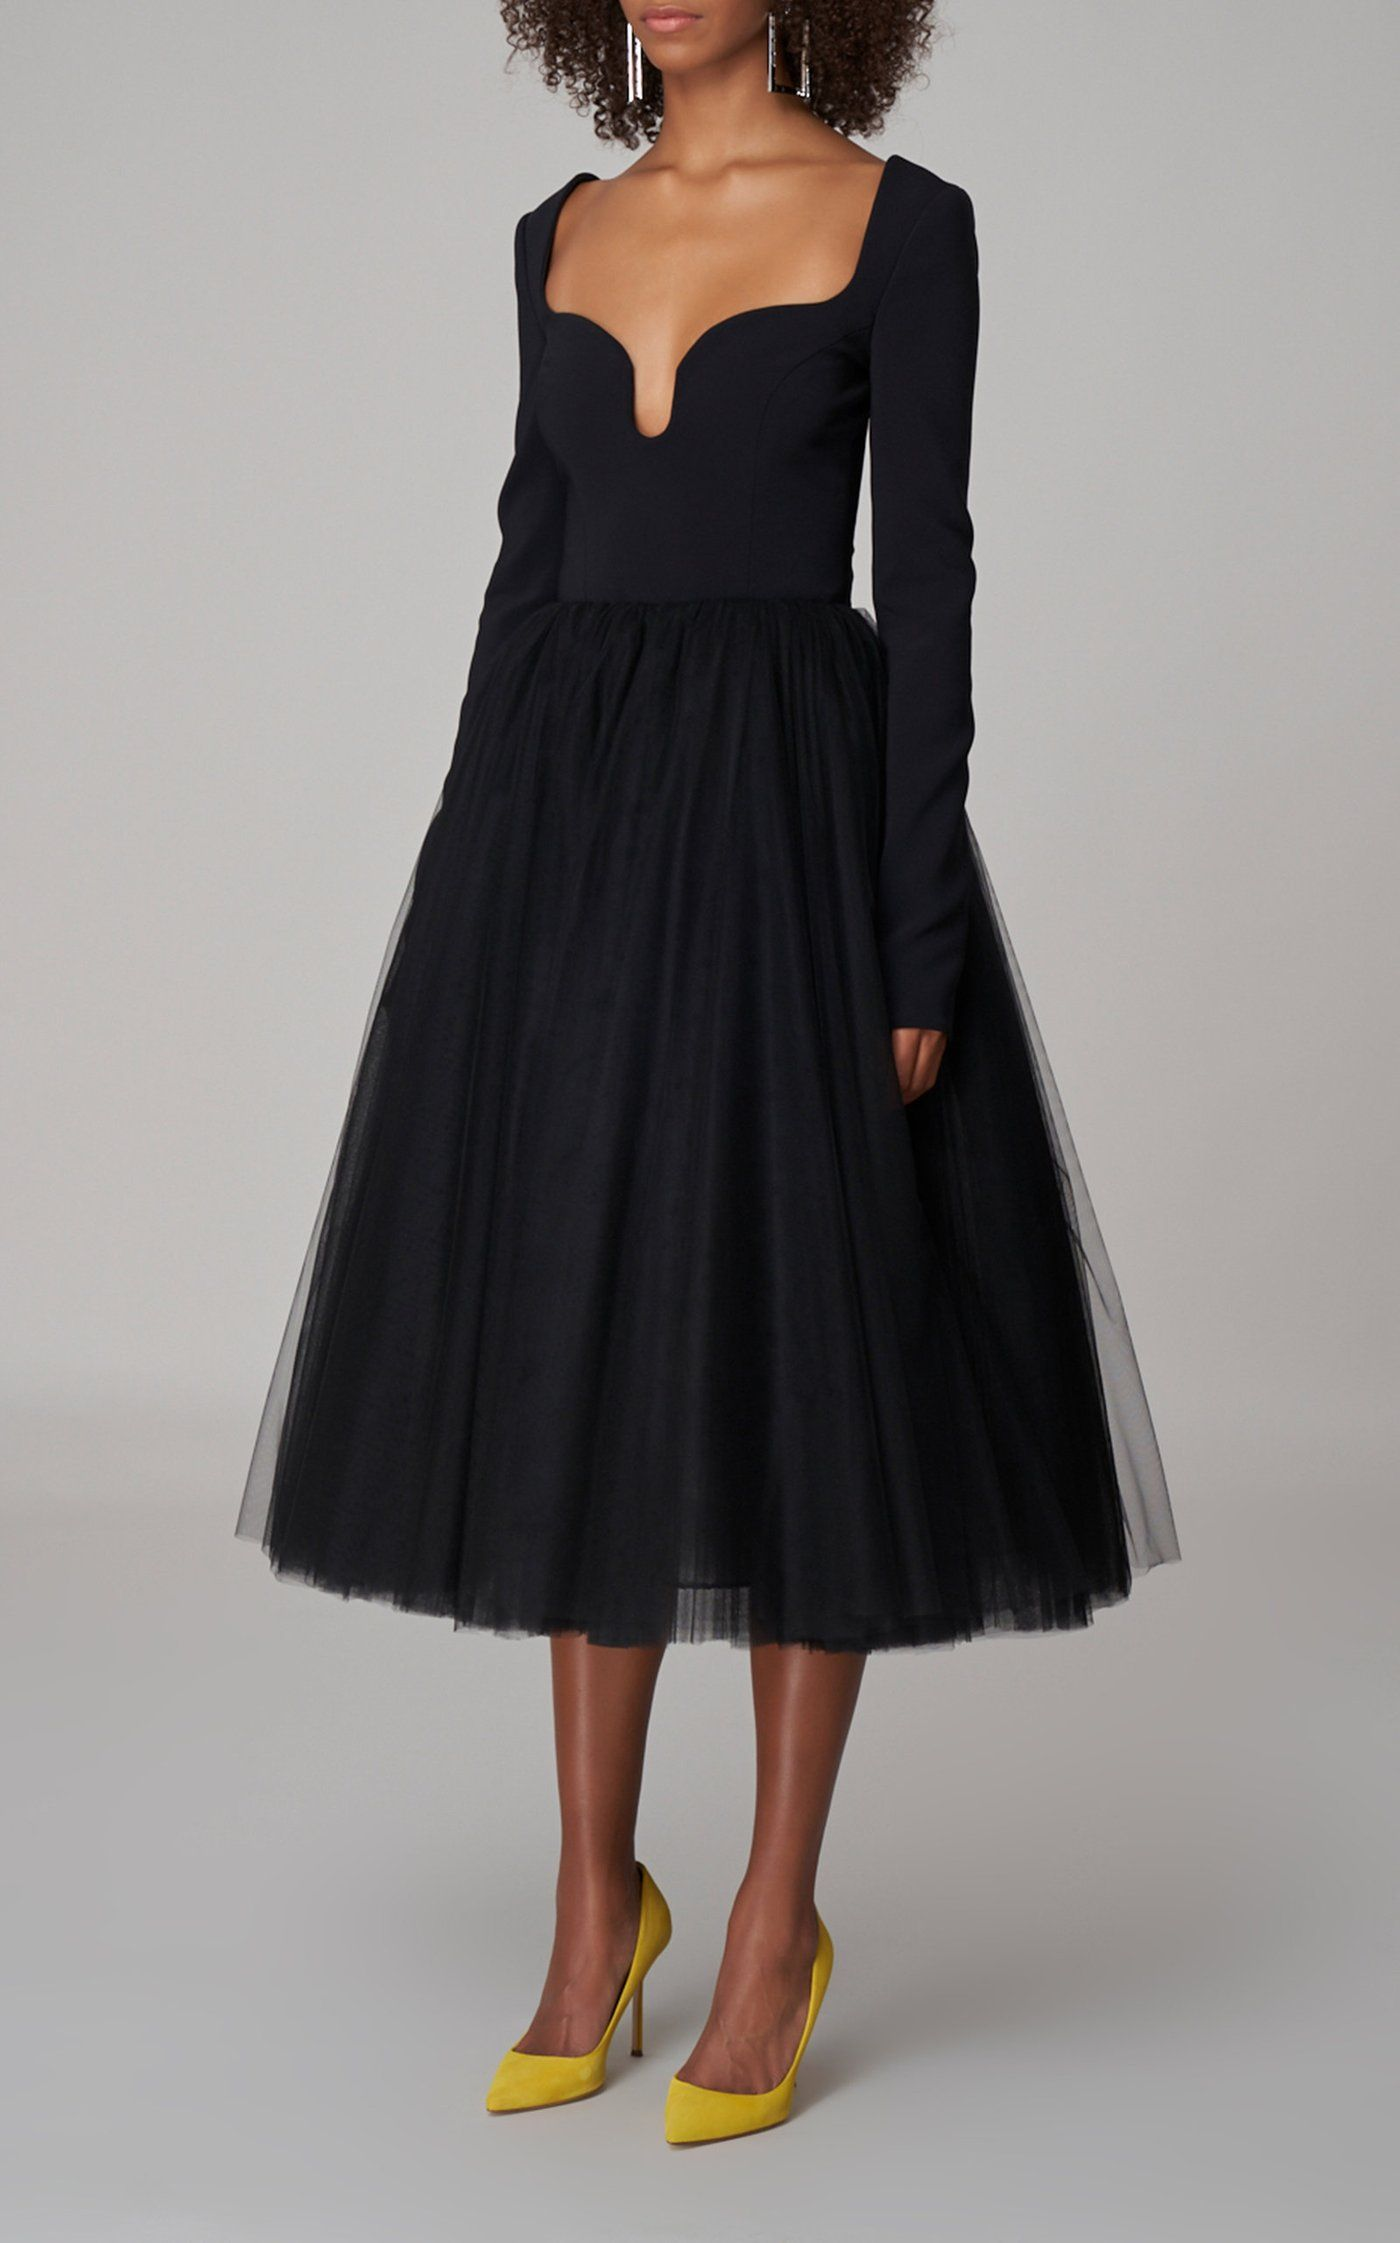 Stretch Crepe Midi Dress By Carolina Herrera Moda Operandi In 2021 Carolina Herrera Dresses Dresses Fashion [ 2243 x 1400 Pixel ]